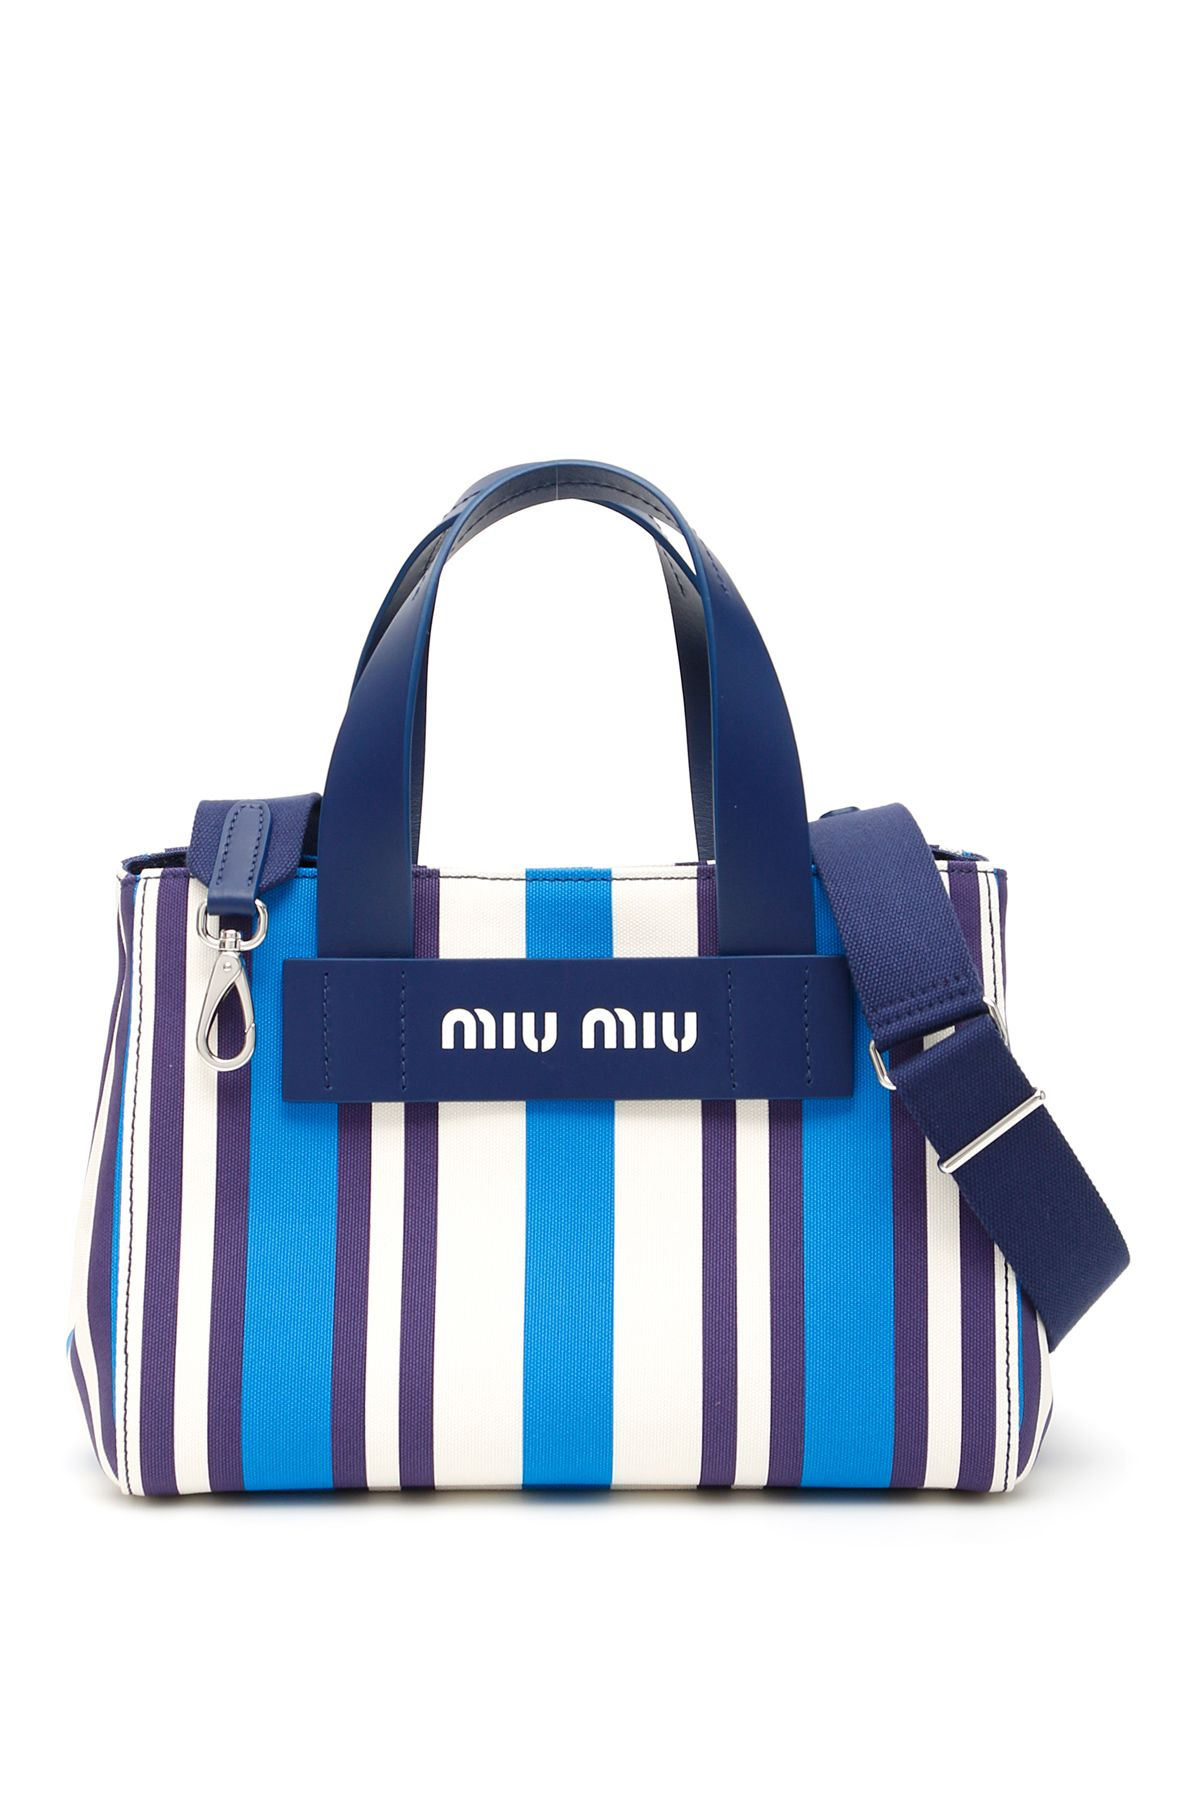 4bad71bb07de Miu Miu Miu Miu Small Multicolor Striped Shopper - TURCHESE